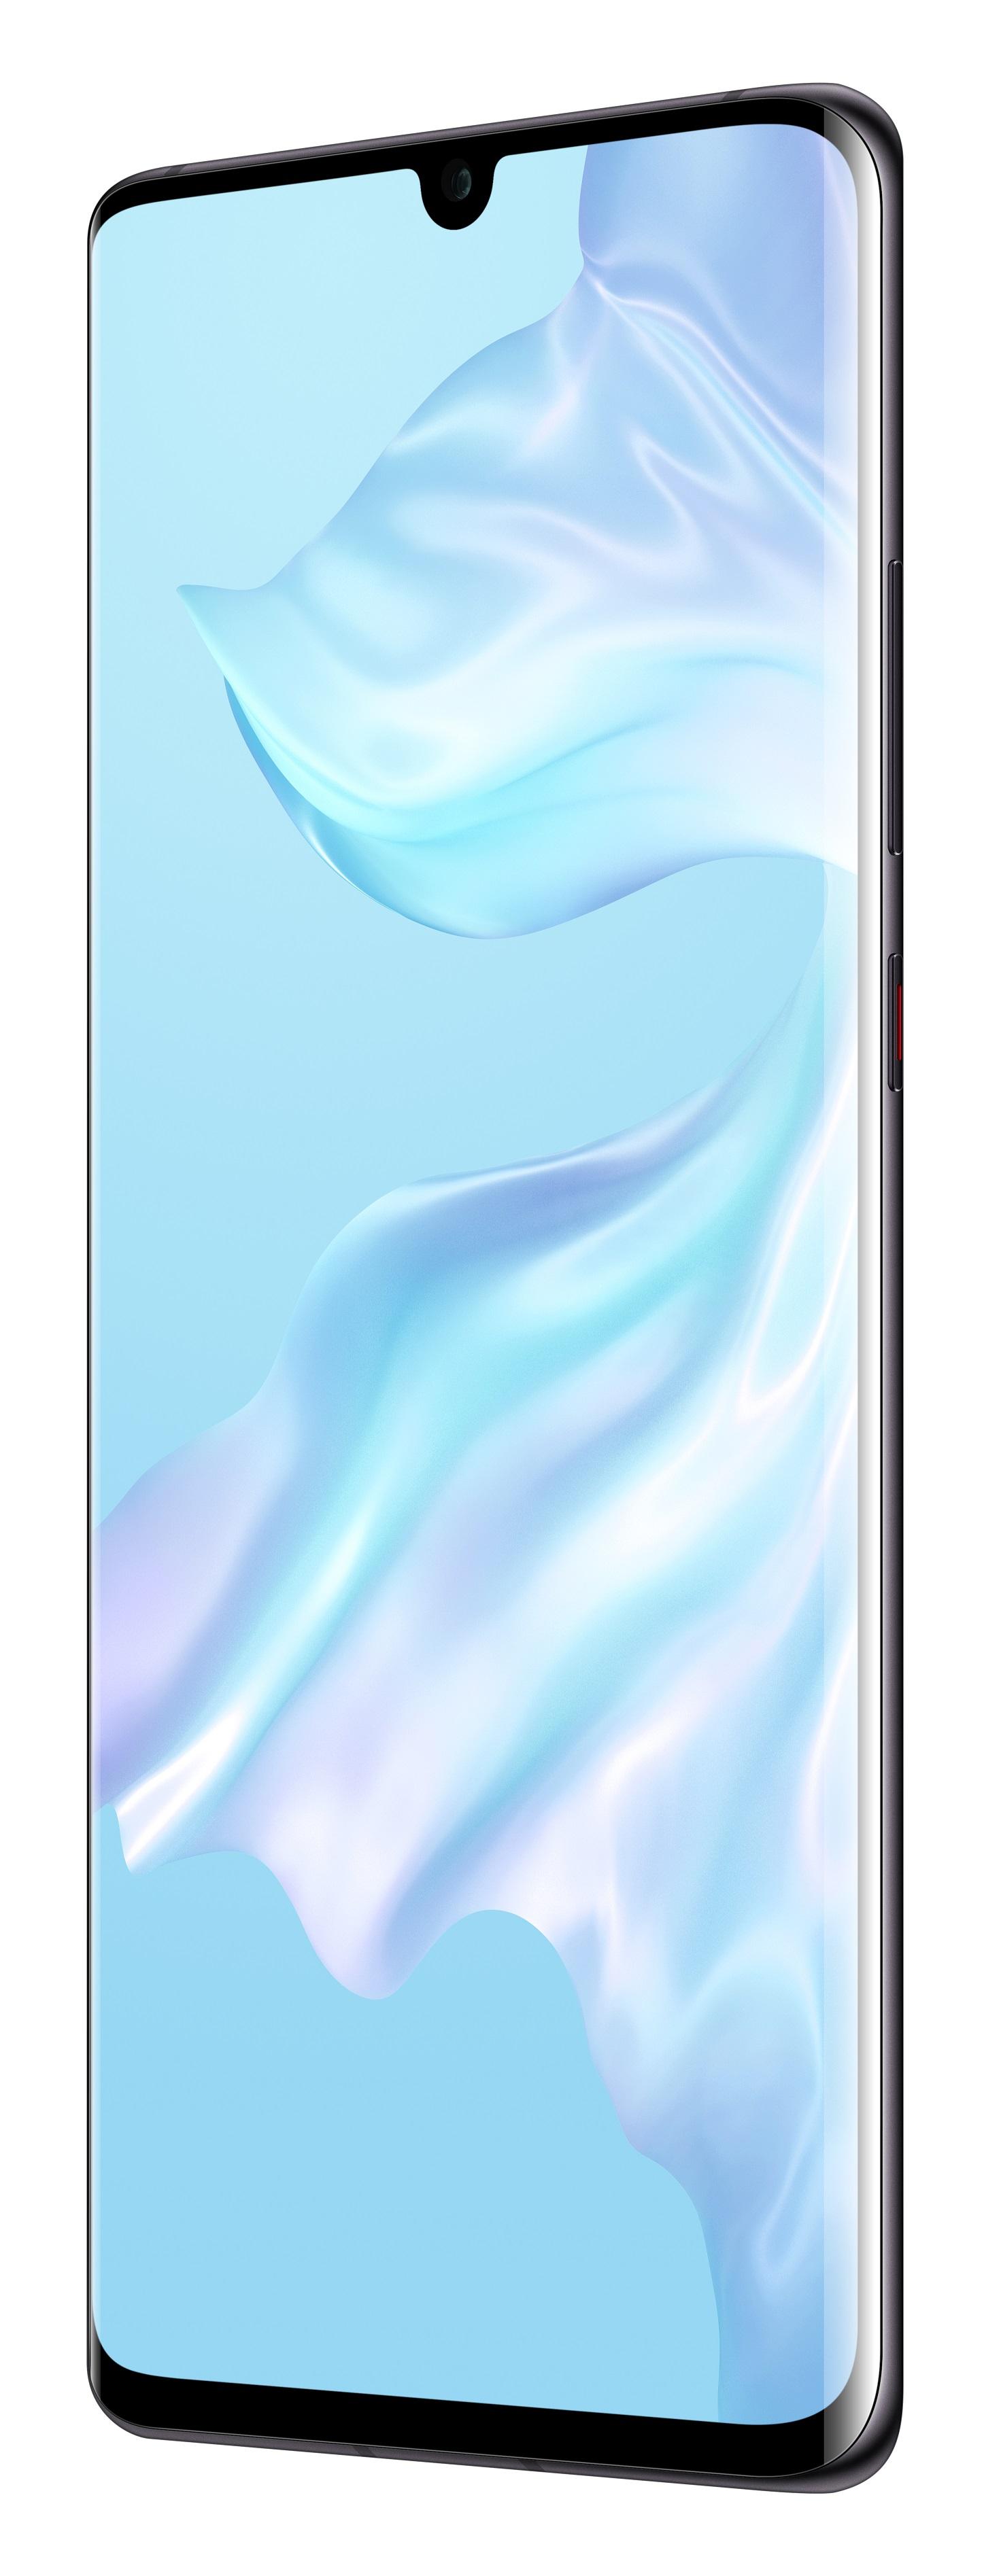 Huawei P30 Pro 128GB schwarz Telekom - Dual SIM, Android 9.0 (Pie), BRANDNEU